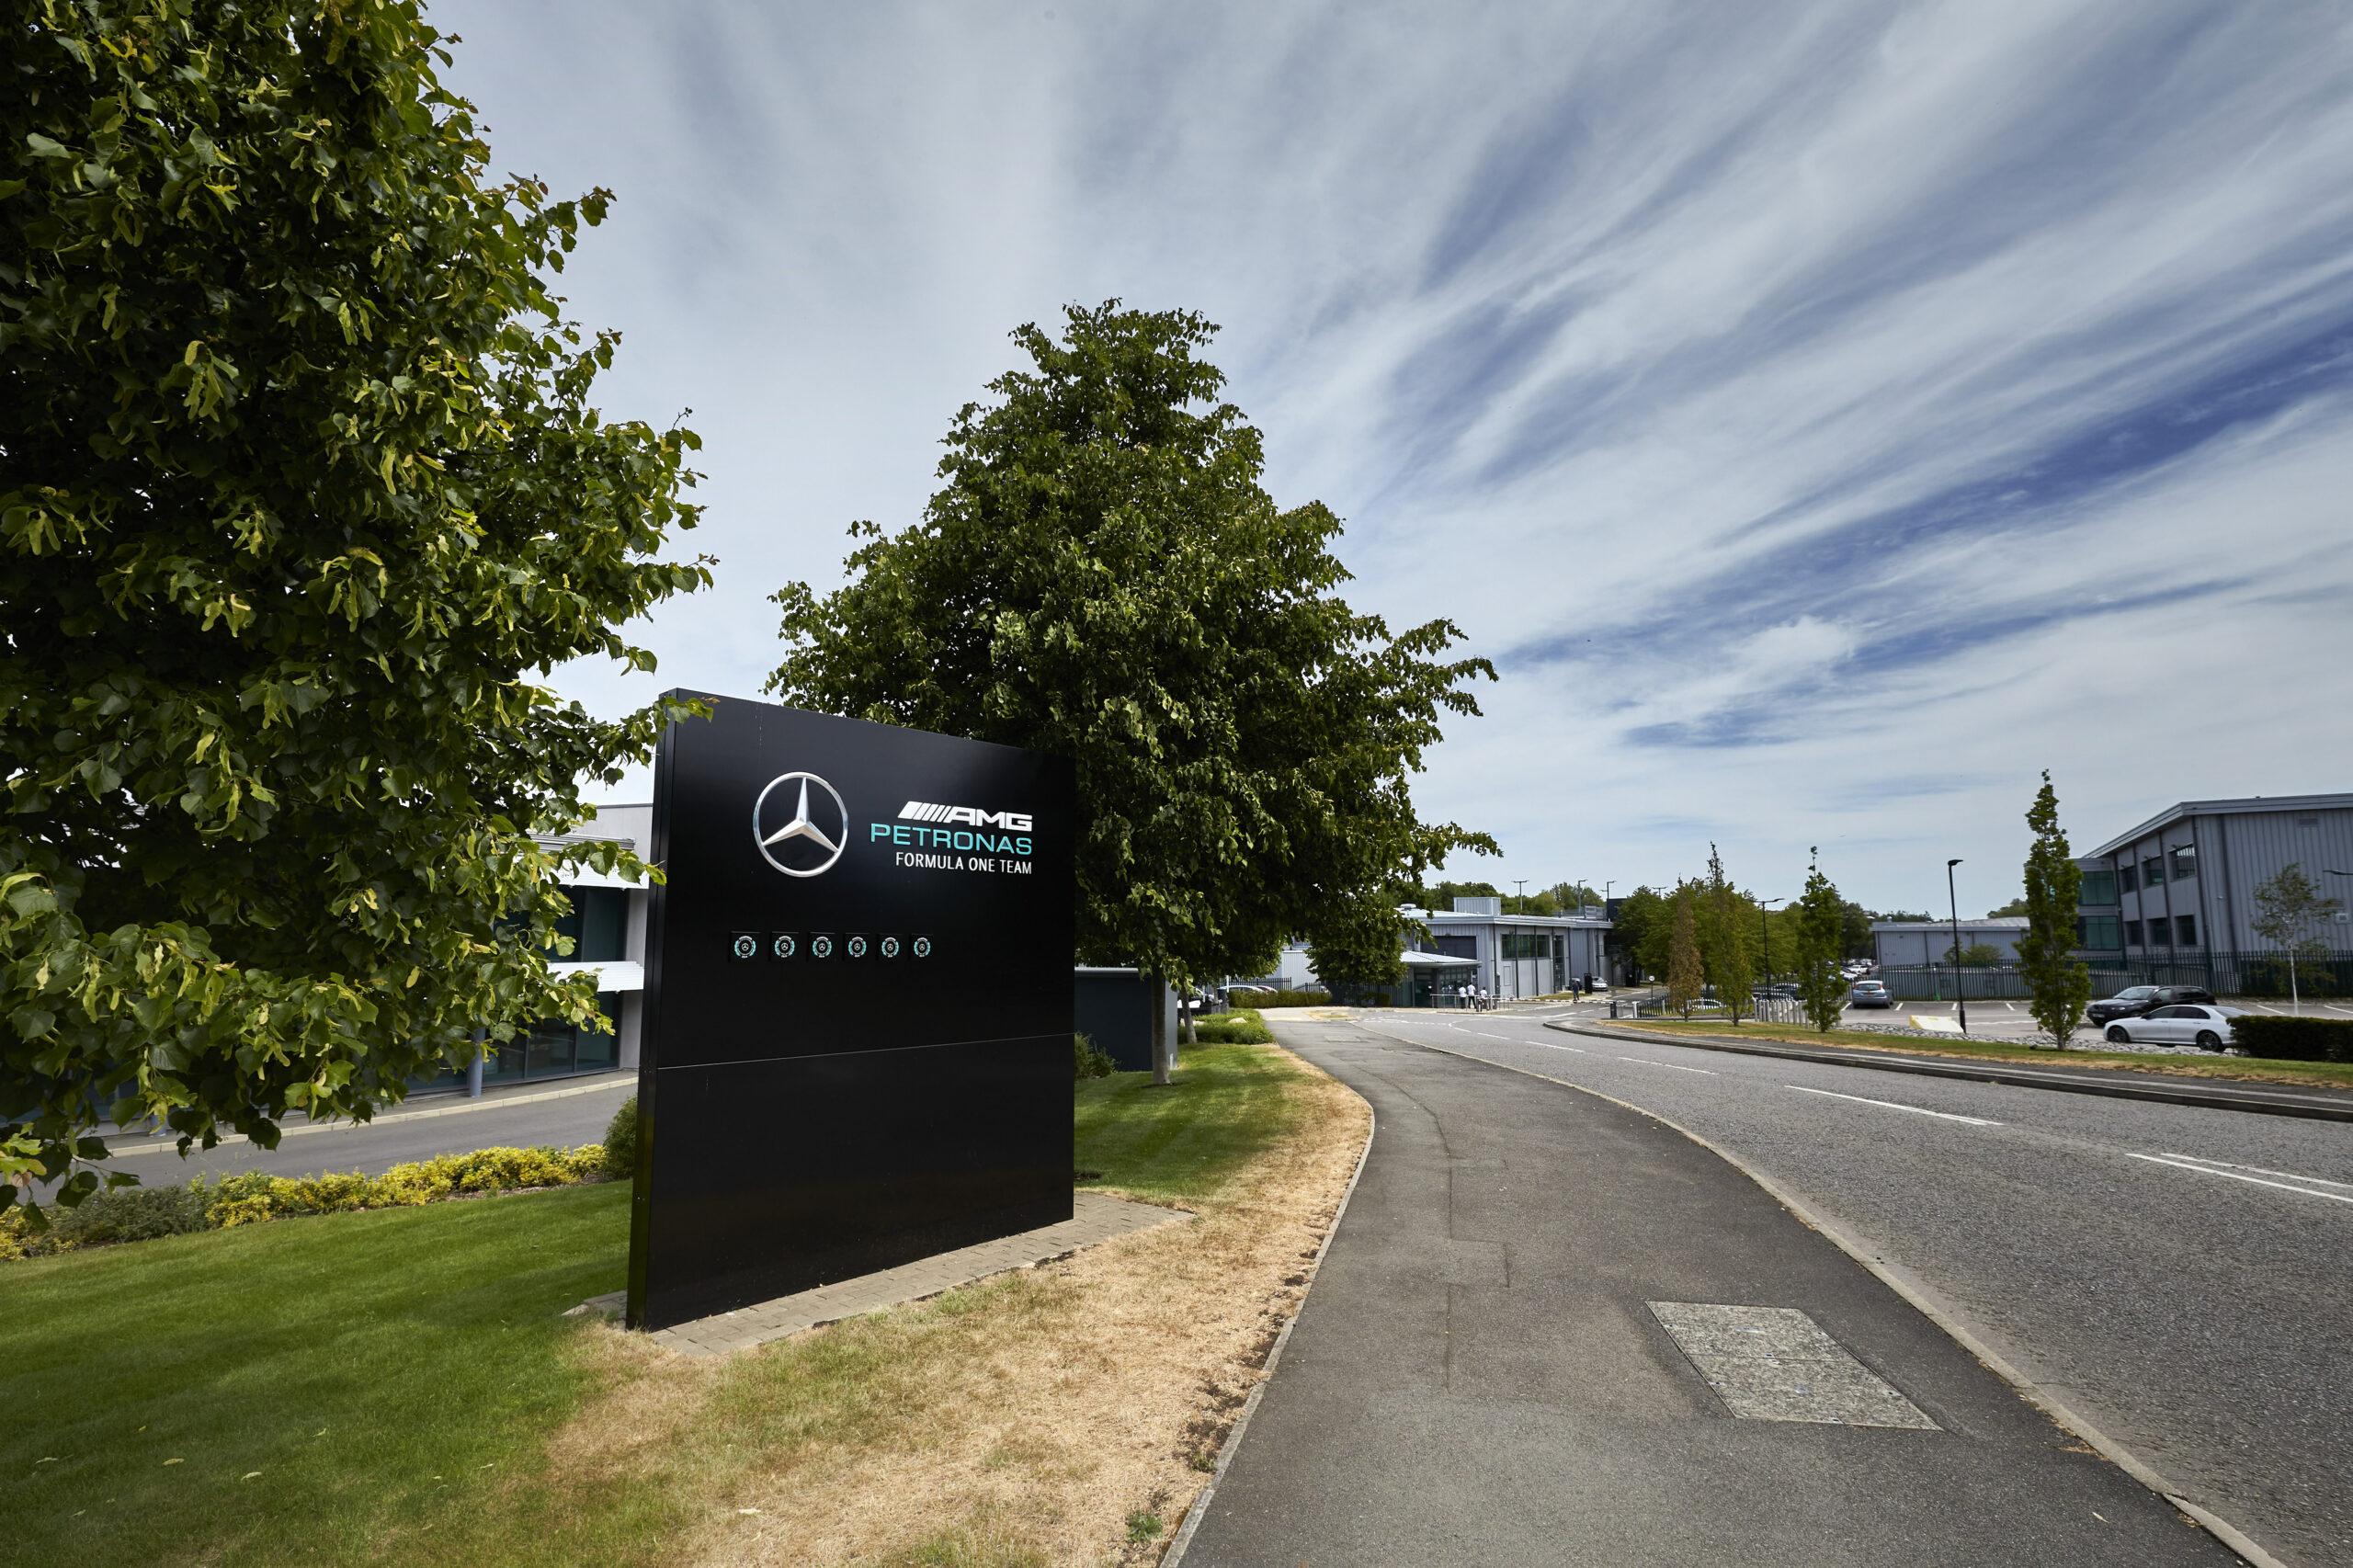 Mercedes-AMG-Formel-1-Team-erh-lt-FIA-3-Sterne-Umwelt-Pr-fsiegel